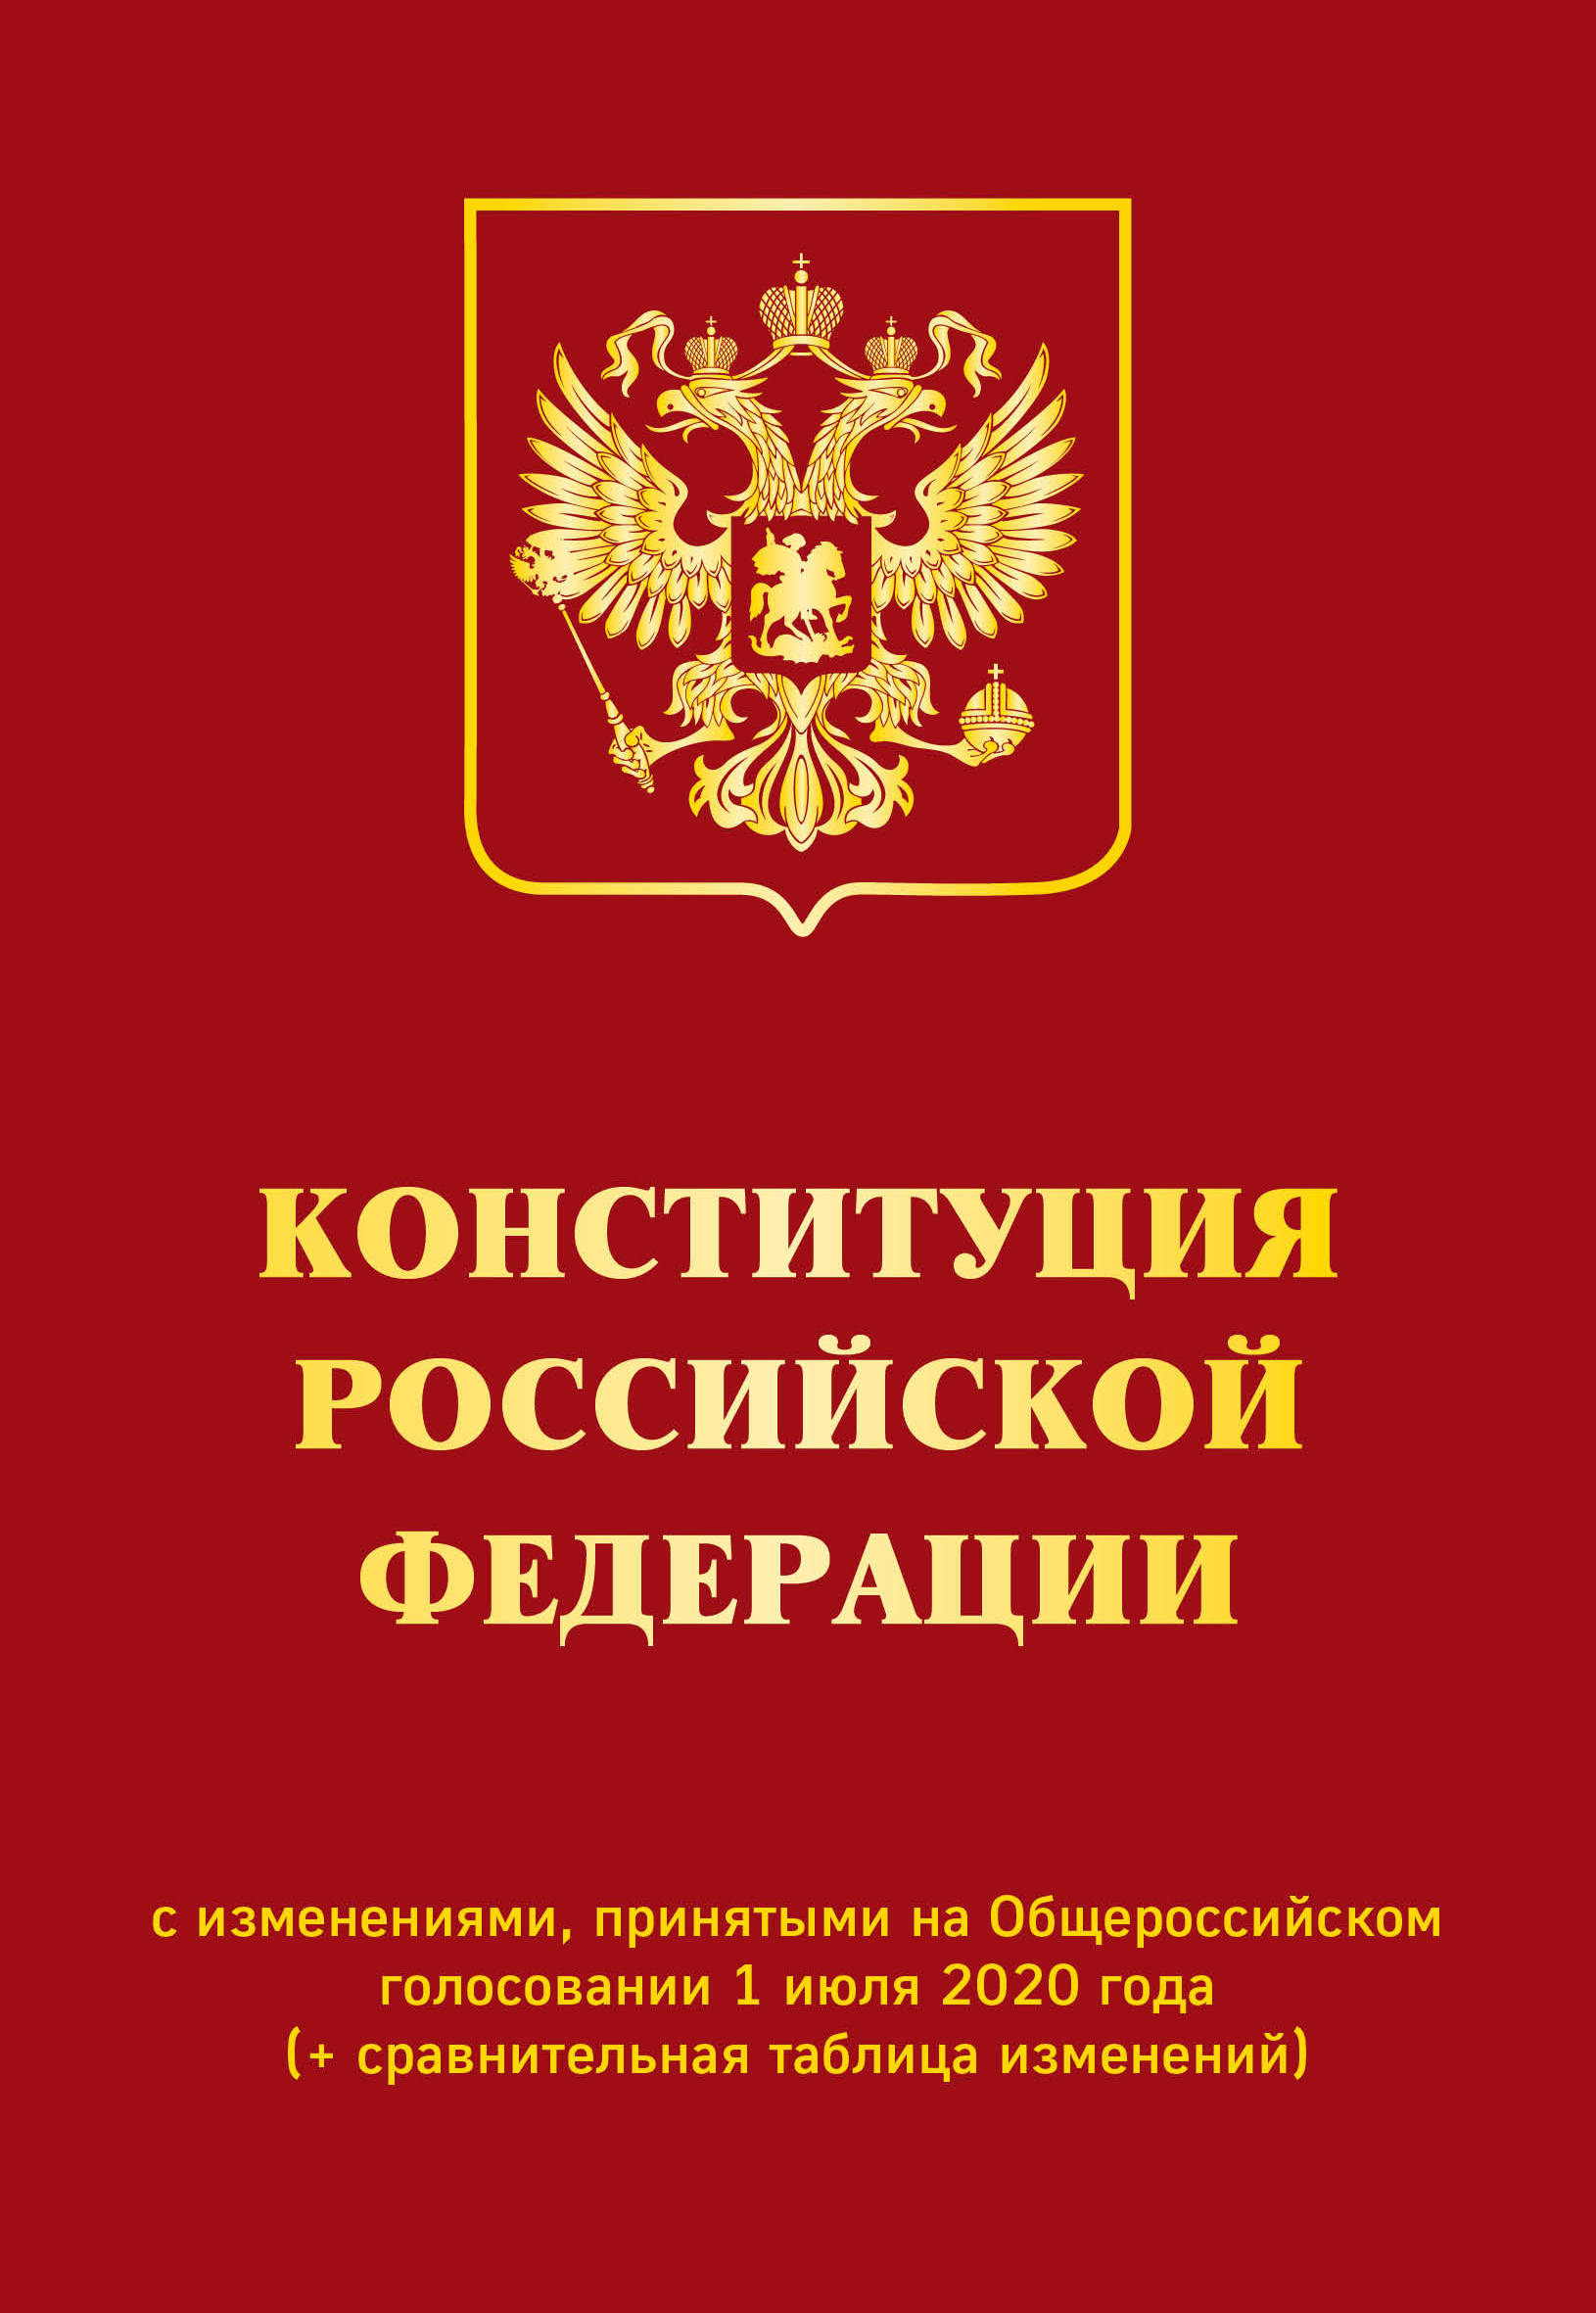 Konstitutsija RF s izmenenijami, prinjatymi na Obscherossijskom golosovanii 1 ijulja 2020 goda (+ sravnitelnaja tablitsa izmenenij)